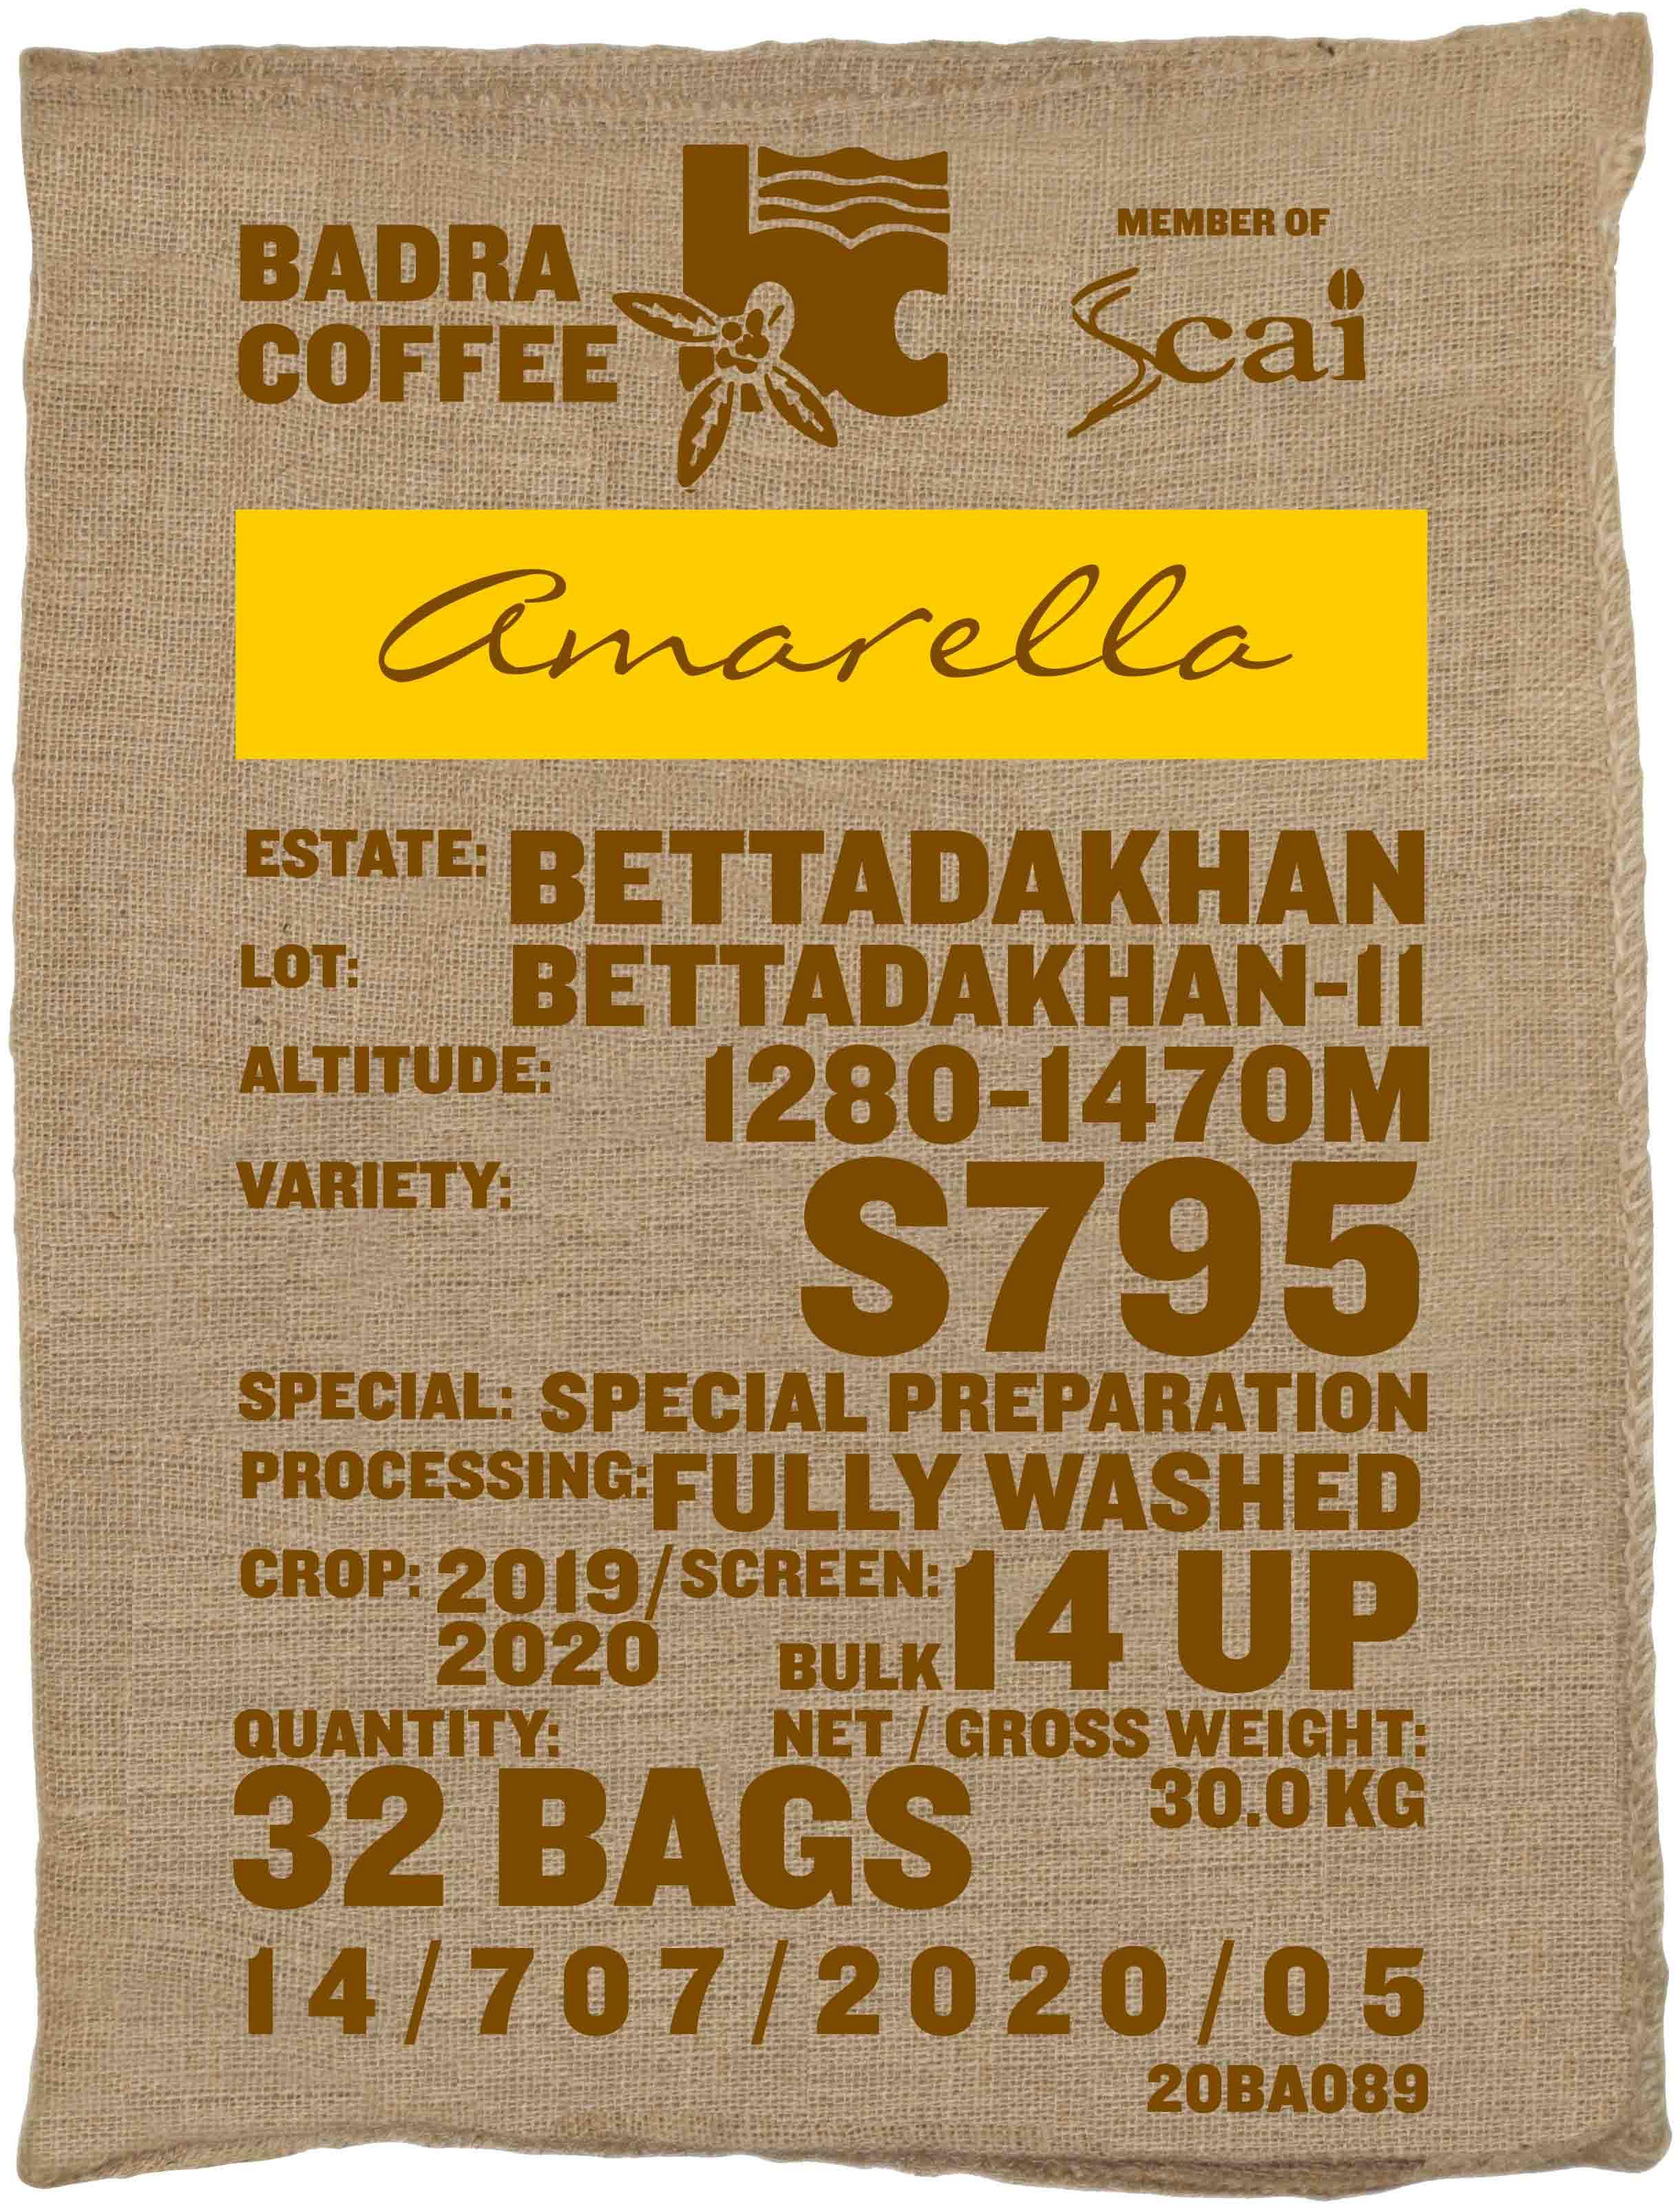 Ein Rohkaffeesack amarella Parzellenkaffee Varietät S795. Badra Estates Lot Bettadakhan 11.